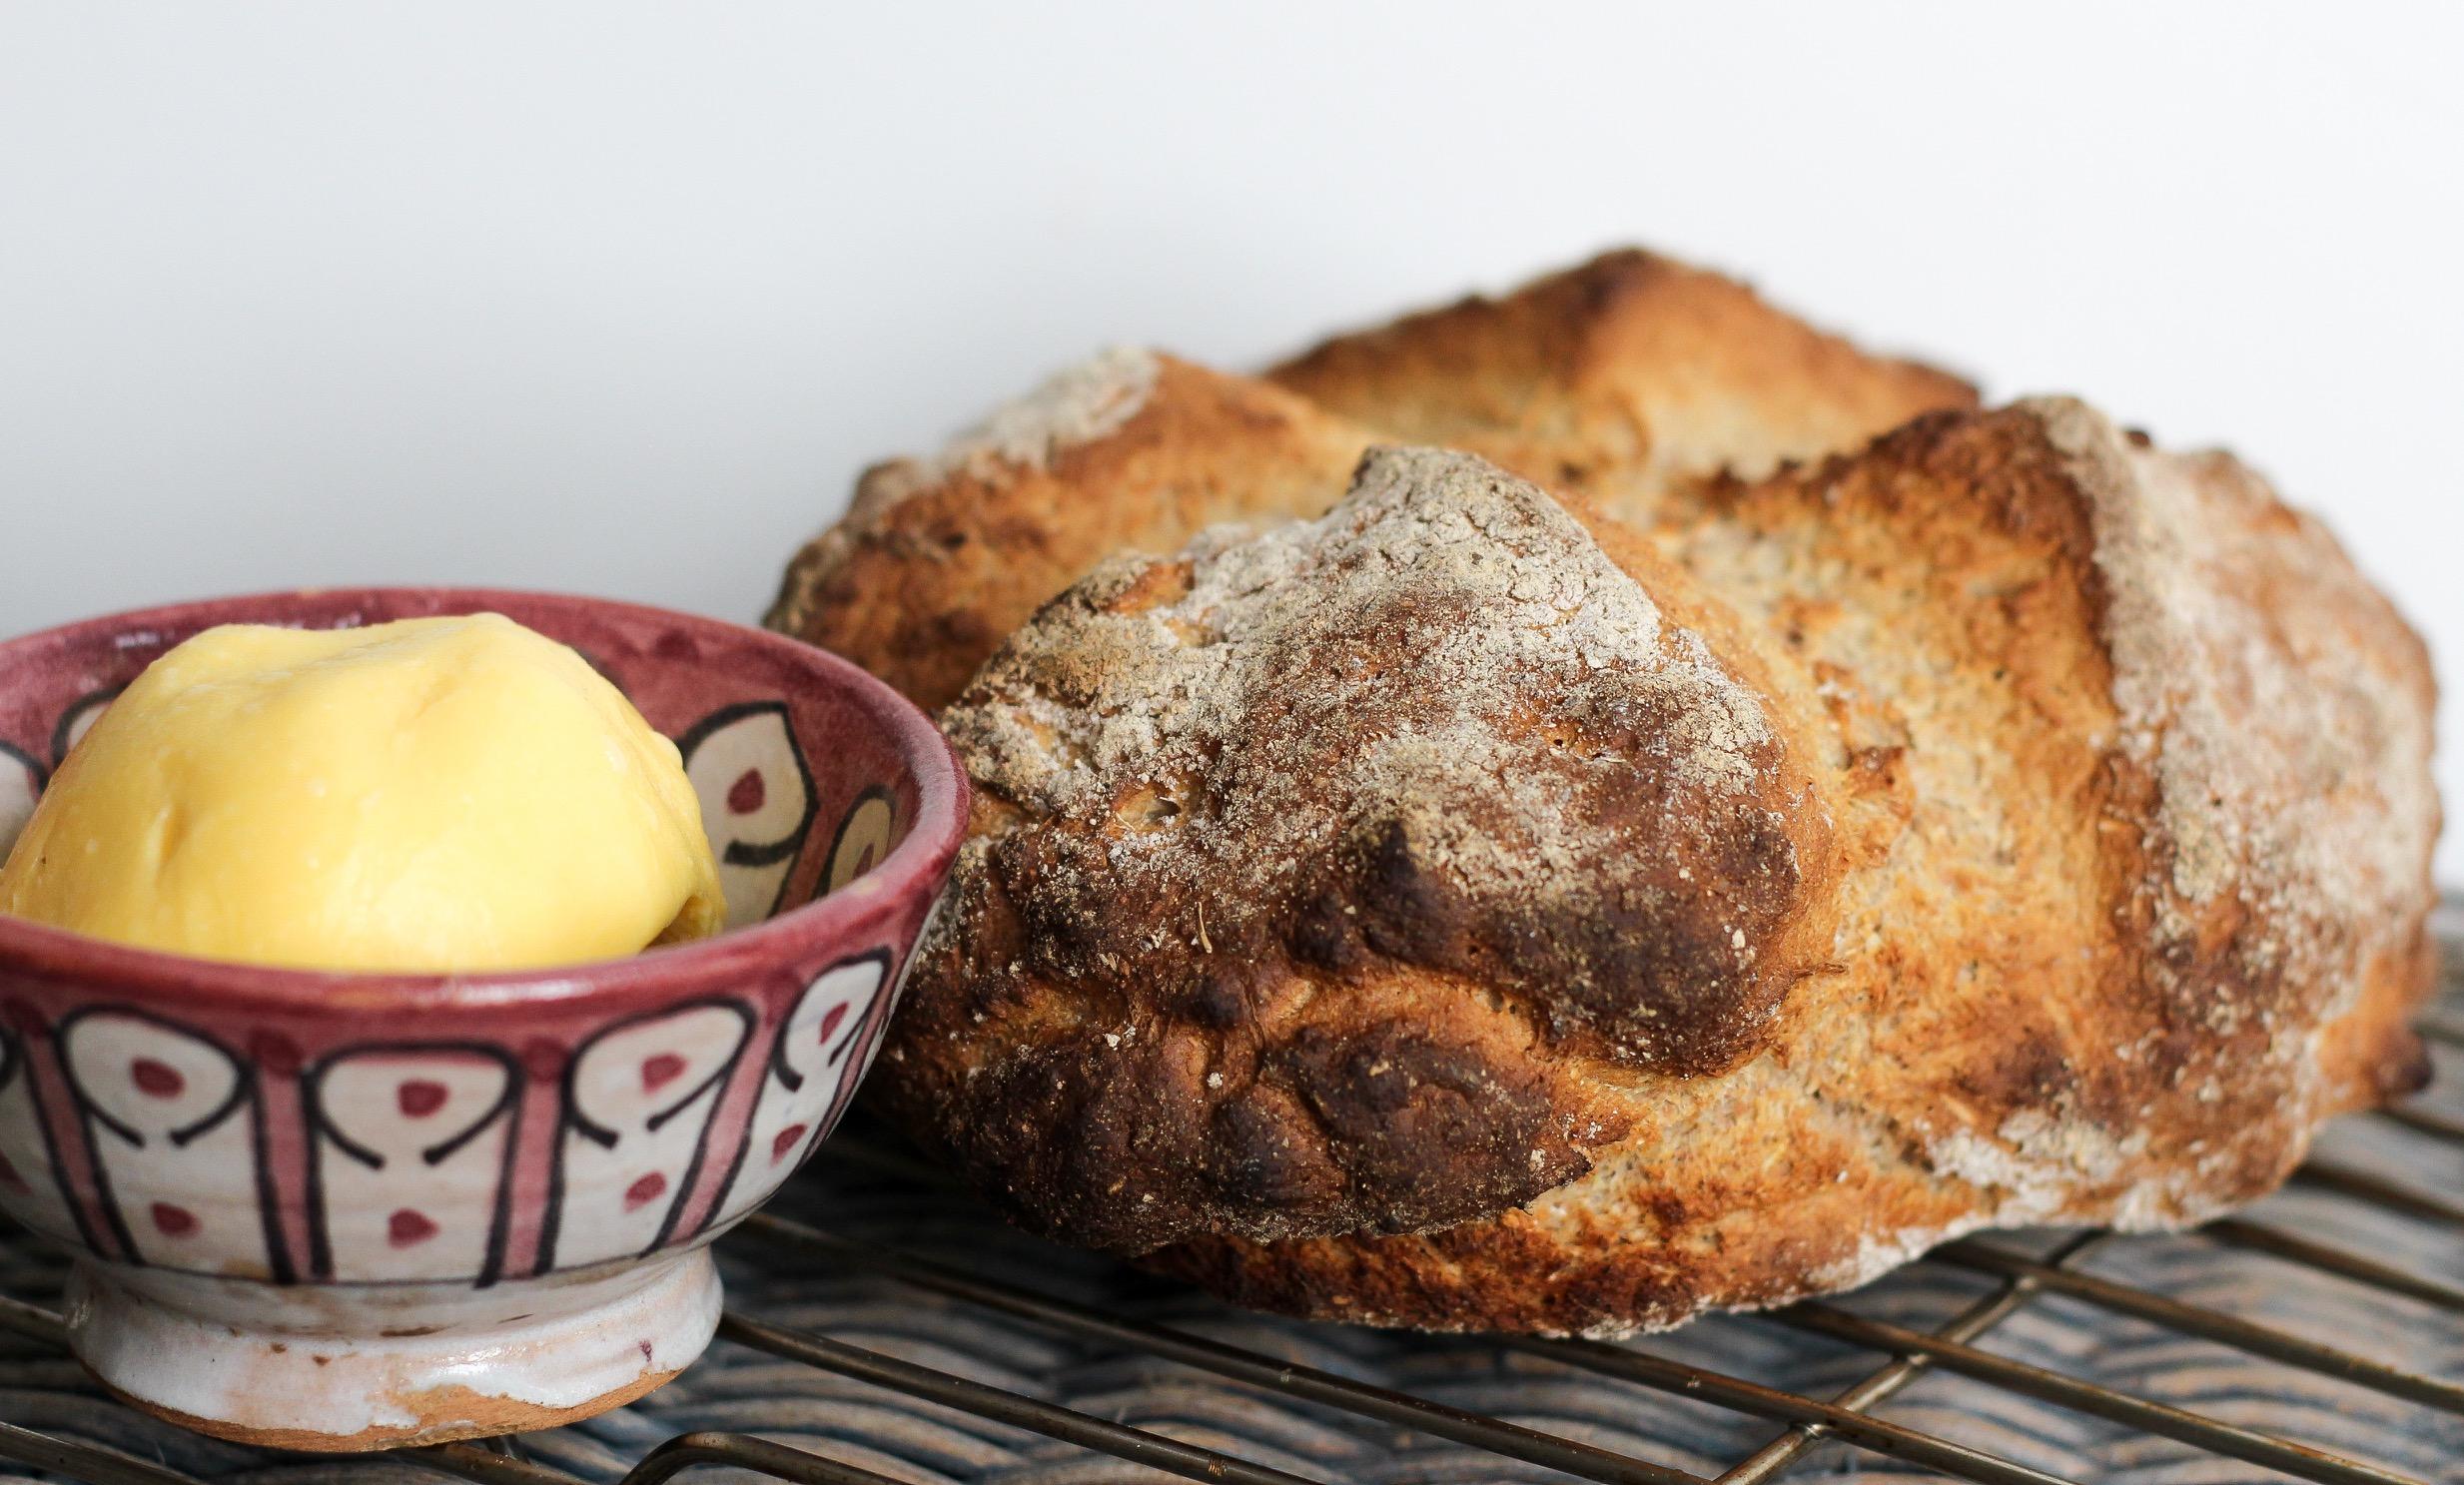 Spelt Soda Bread with Homemade Butter